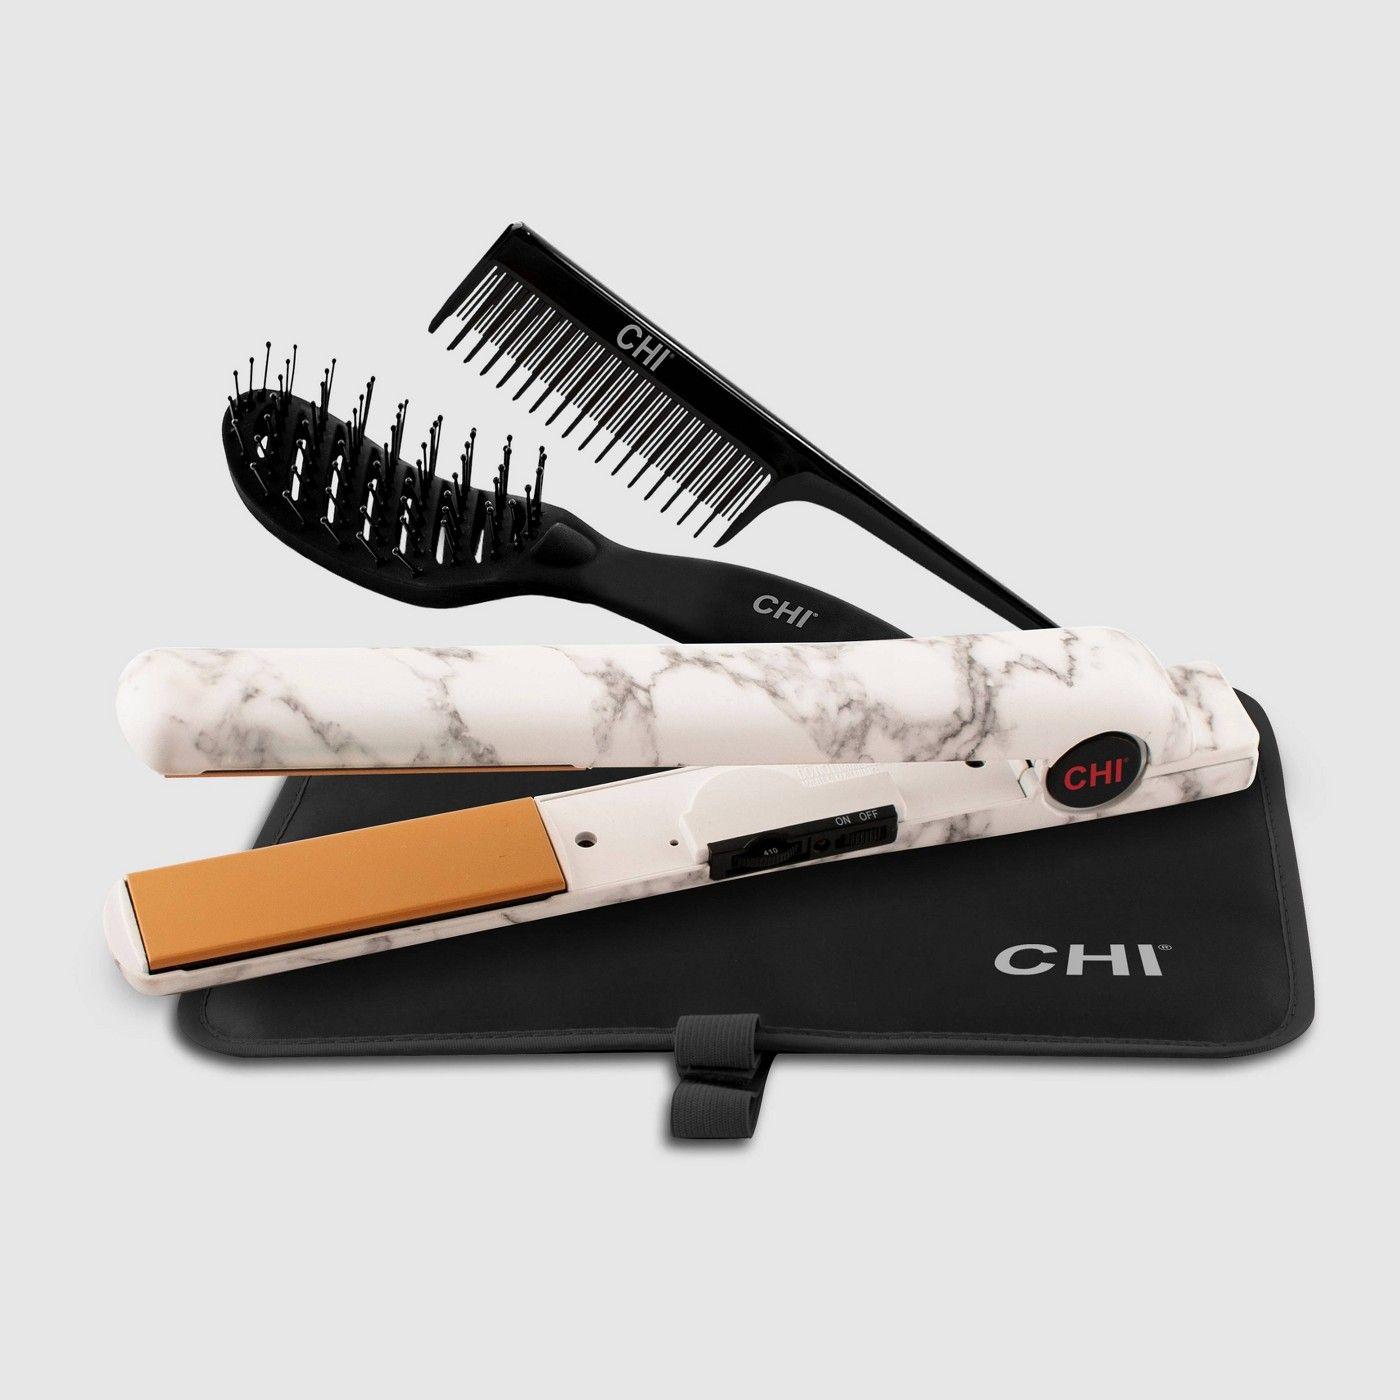 43++ Chi original lava ceramic hairstyling iron ideas in 2021